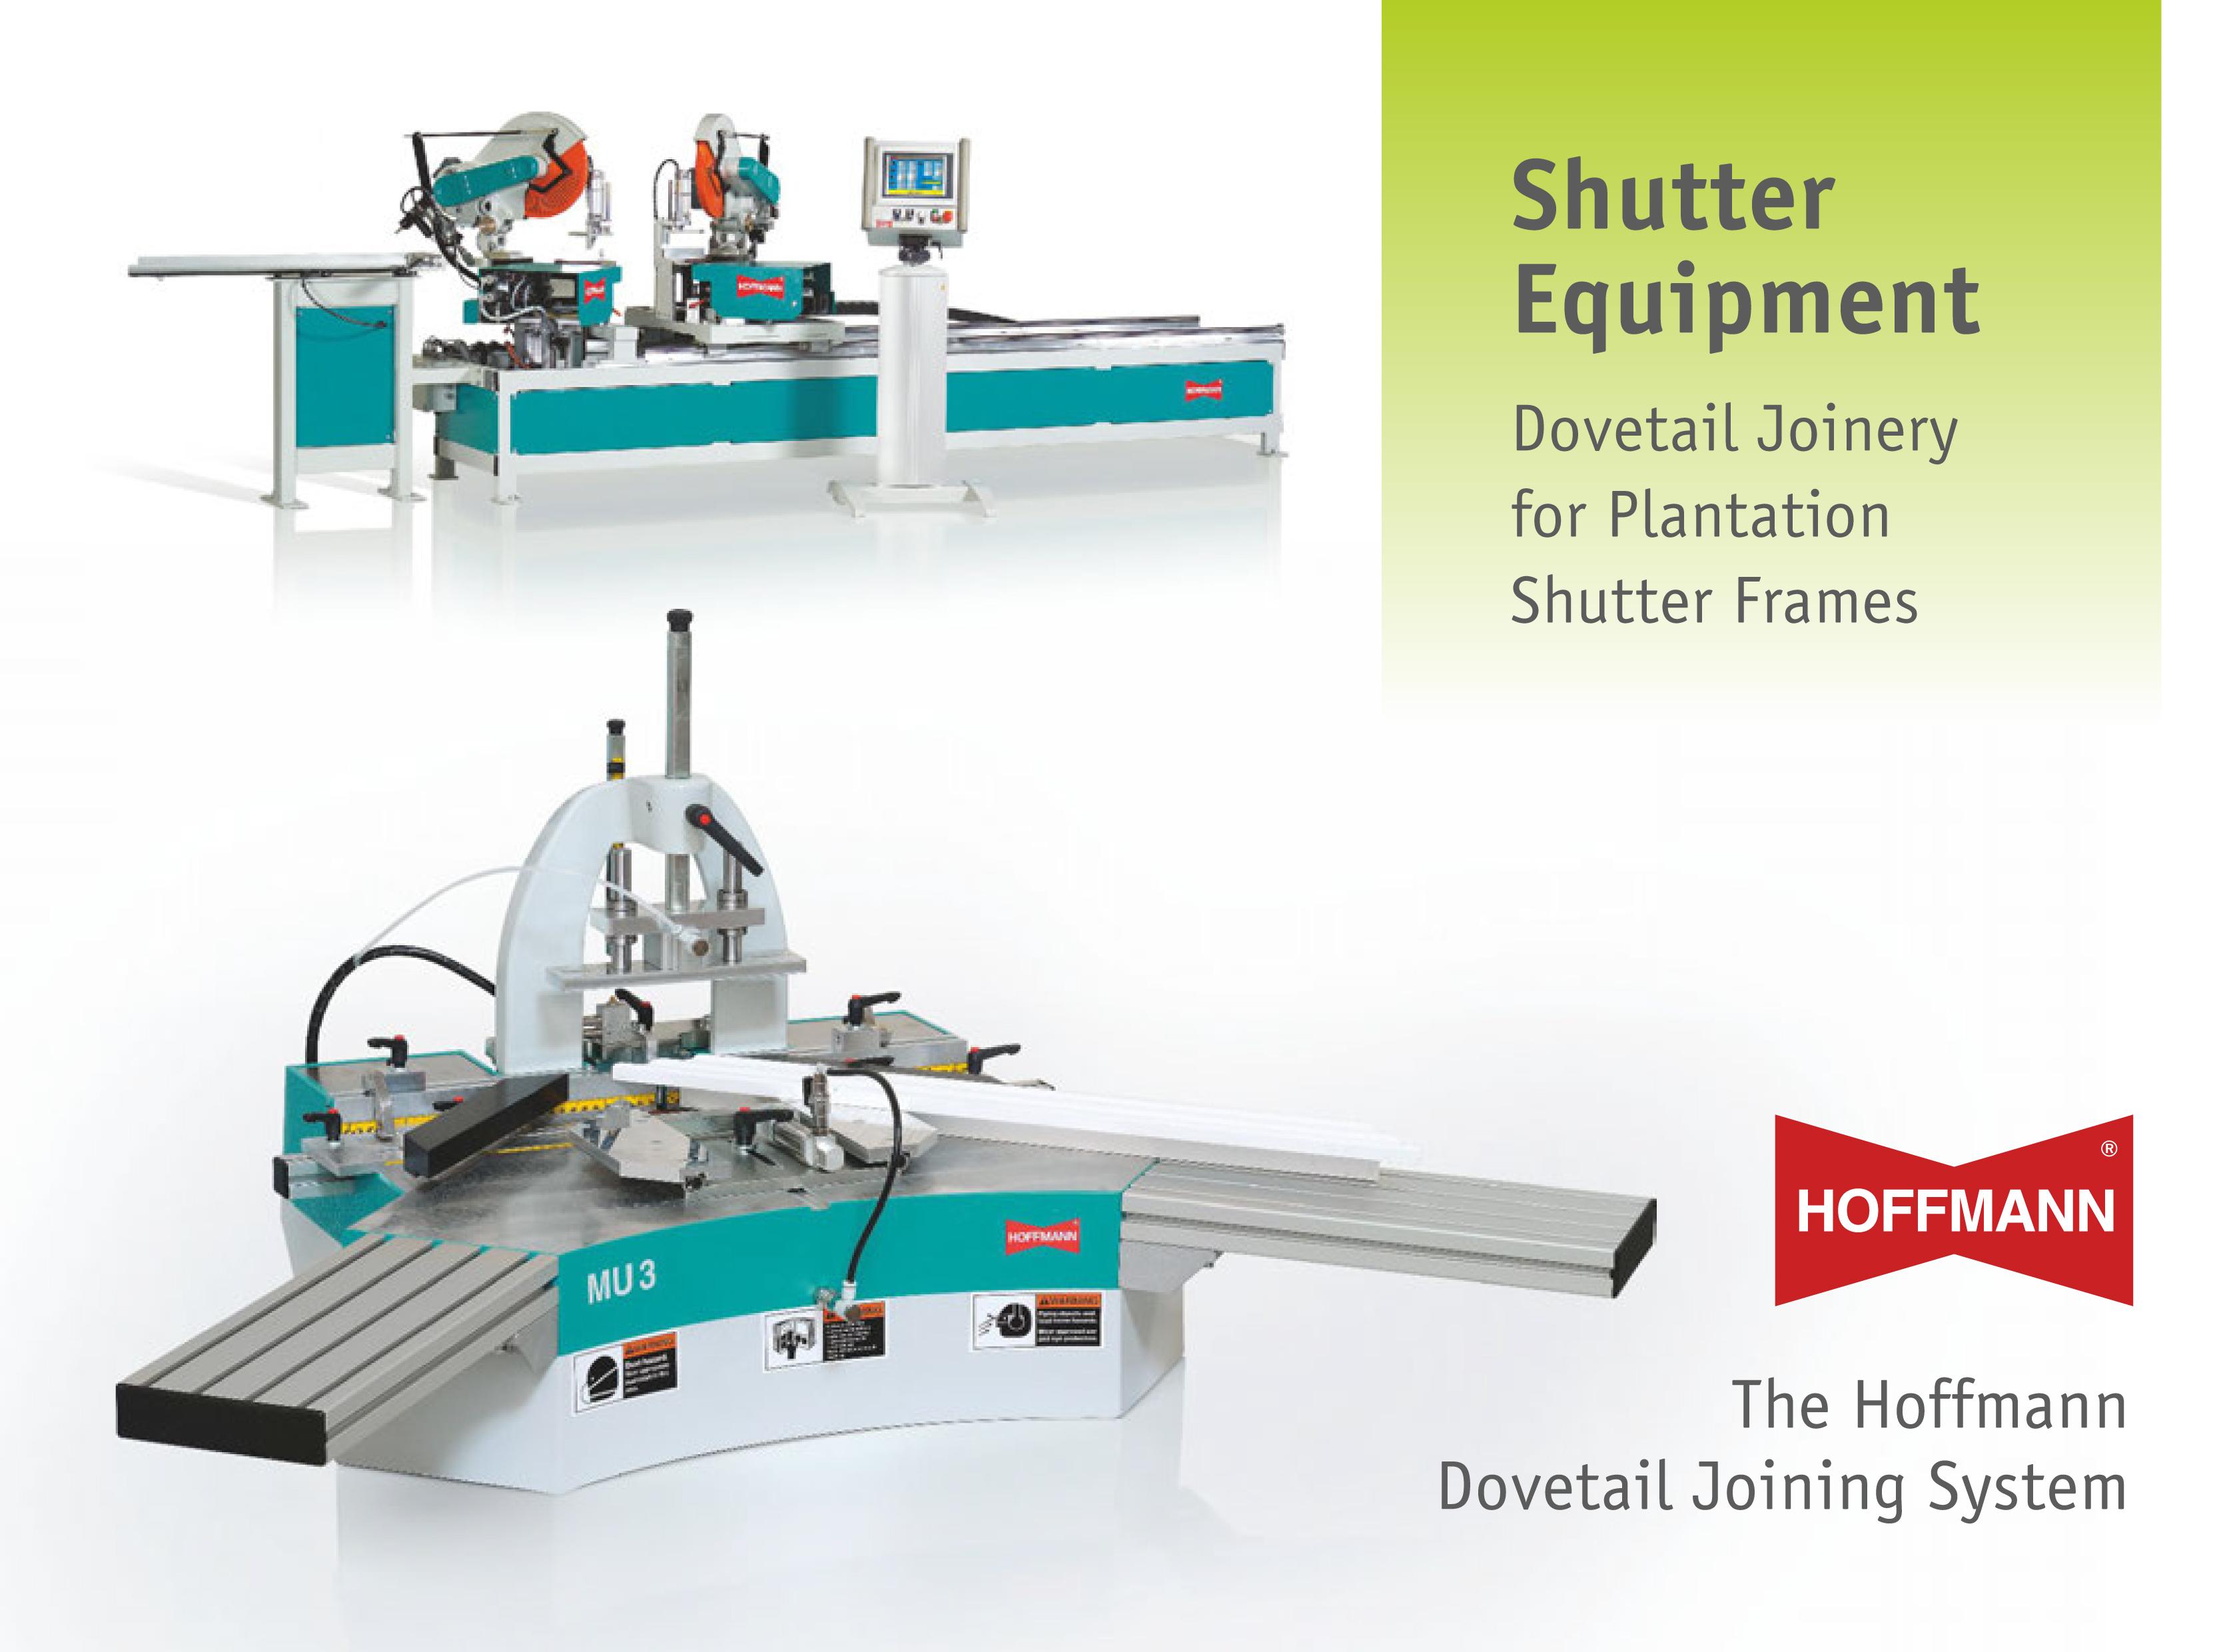 hoffmann-shutter-equipment-catalog-cover-page.jpg